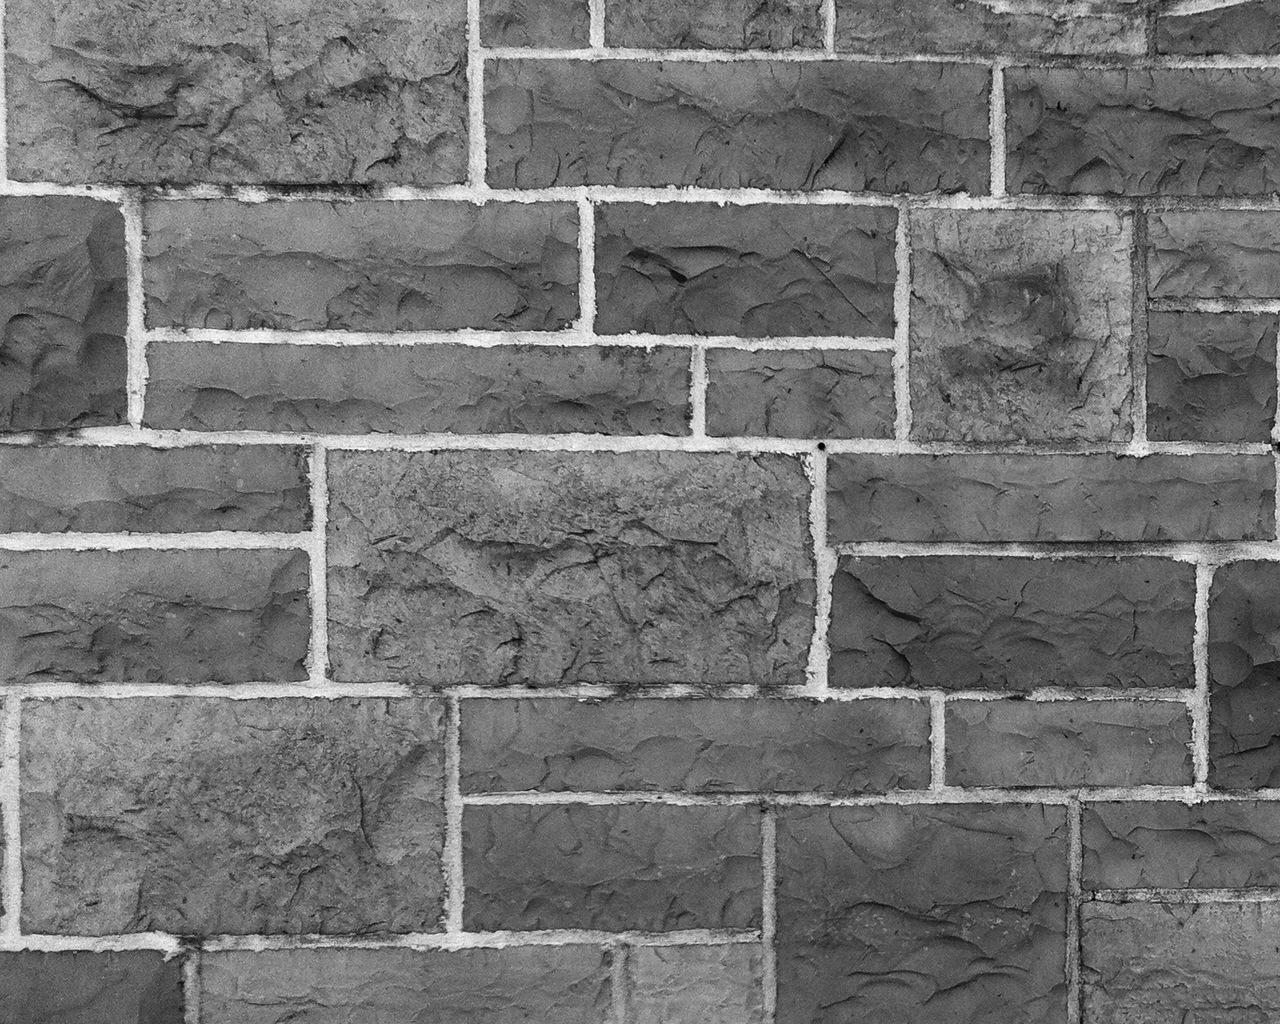 Bricks and Stones Gossip